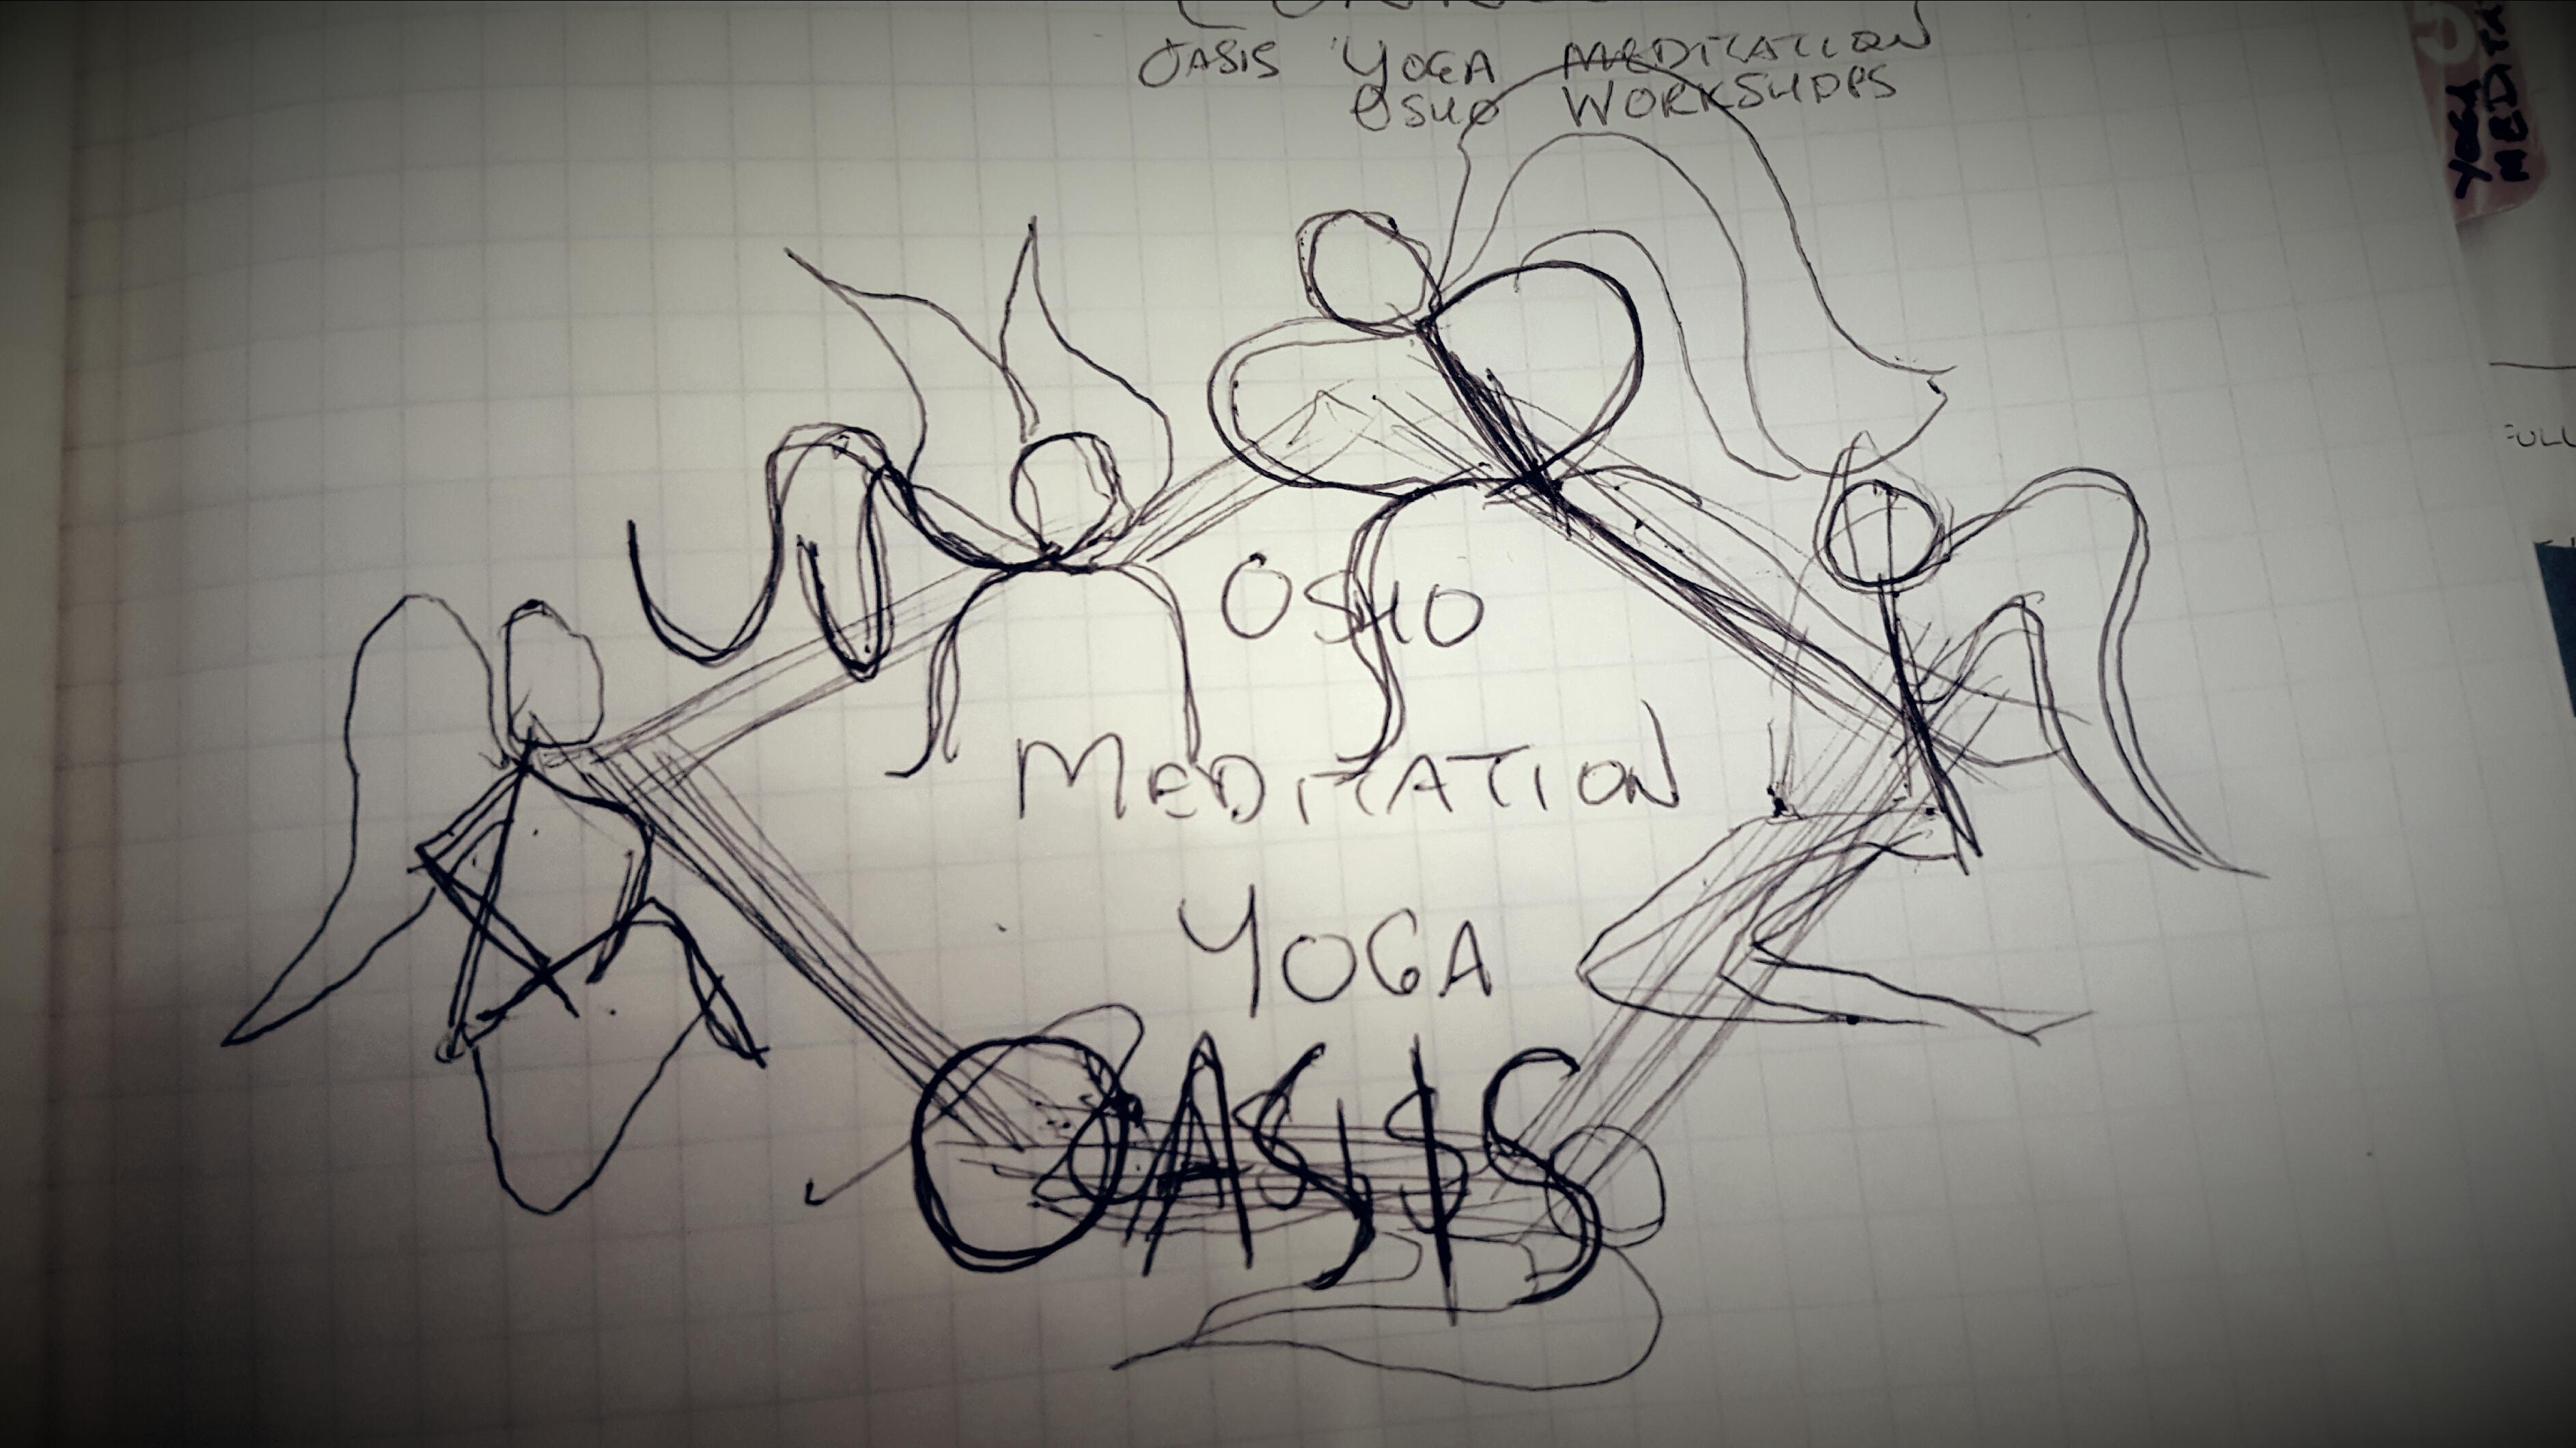 Meditation, Yoga, Oasis, Light Shining, Reading, Freedom, Connection, Prayer, Guidance